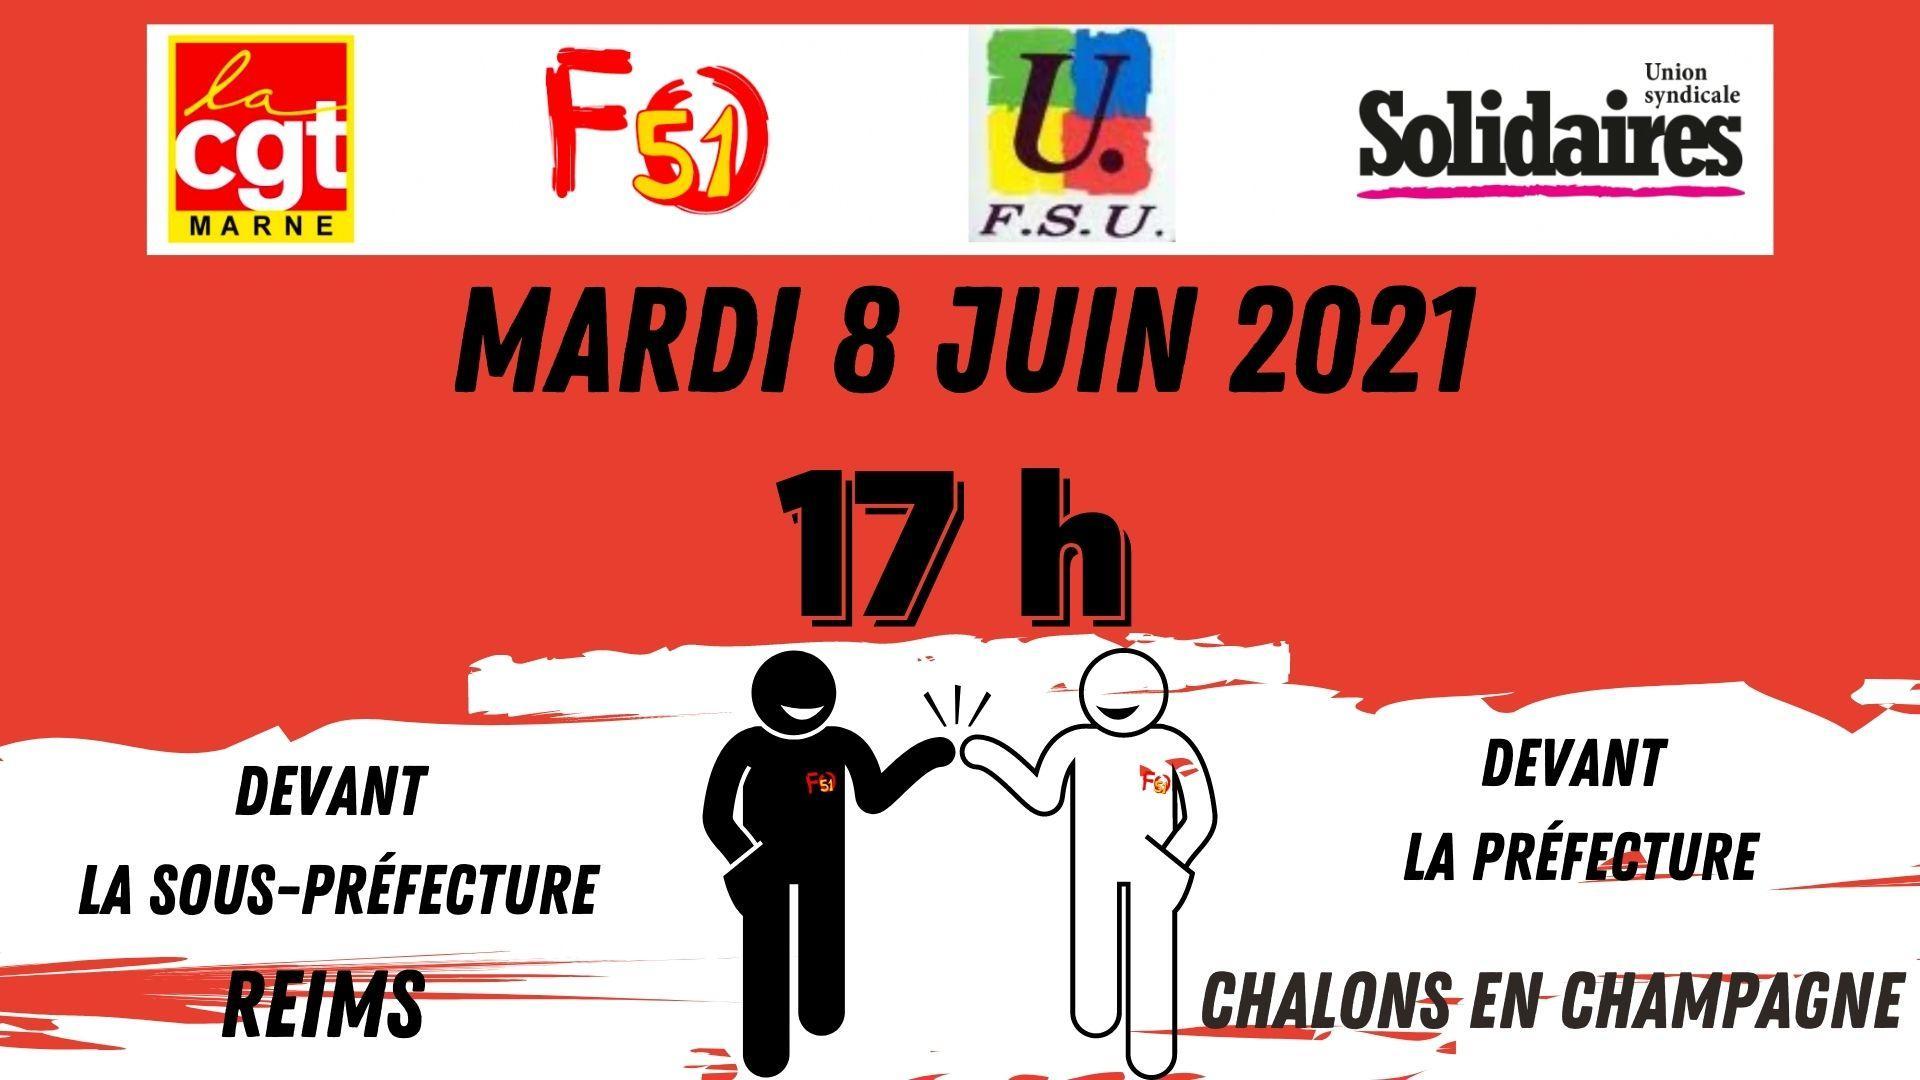 8 juin 2021 rassemblement